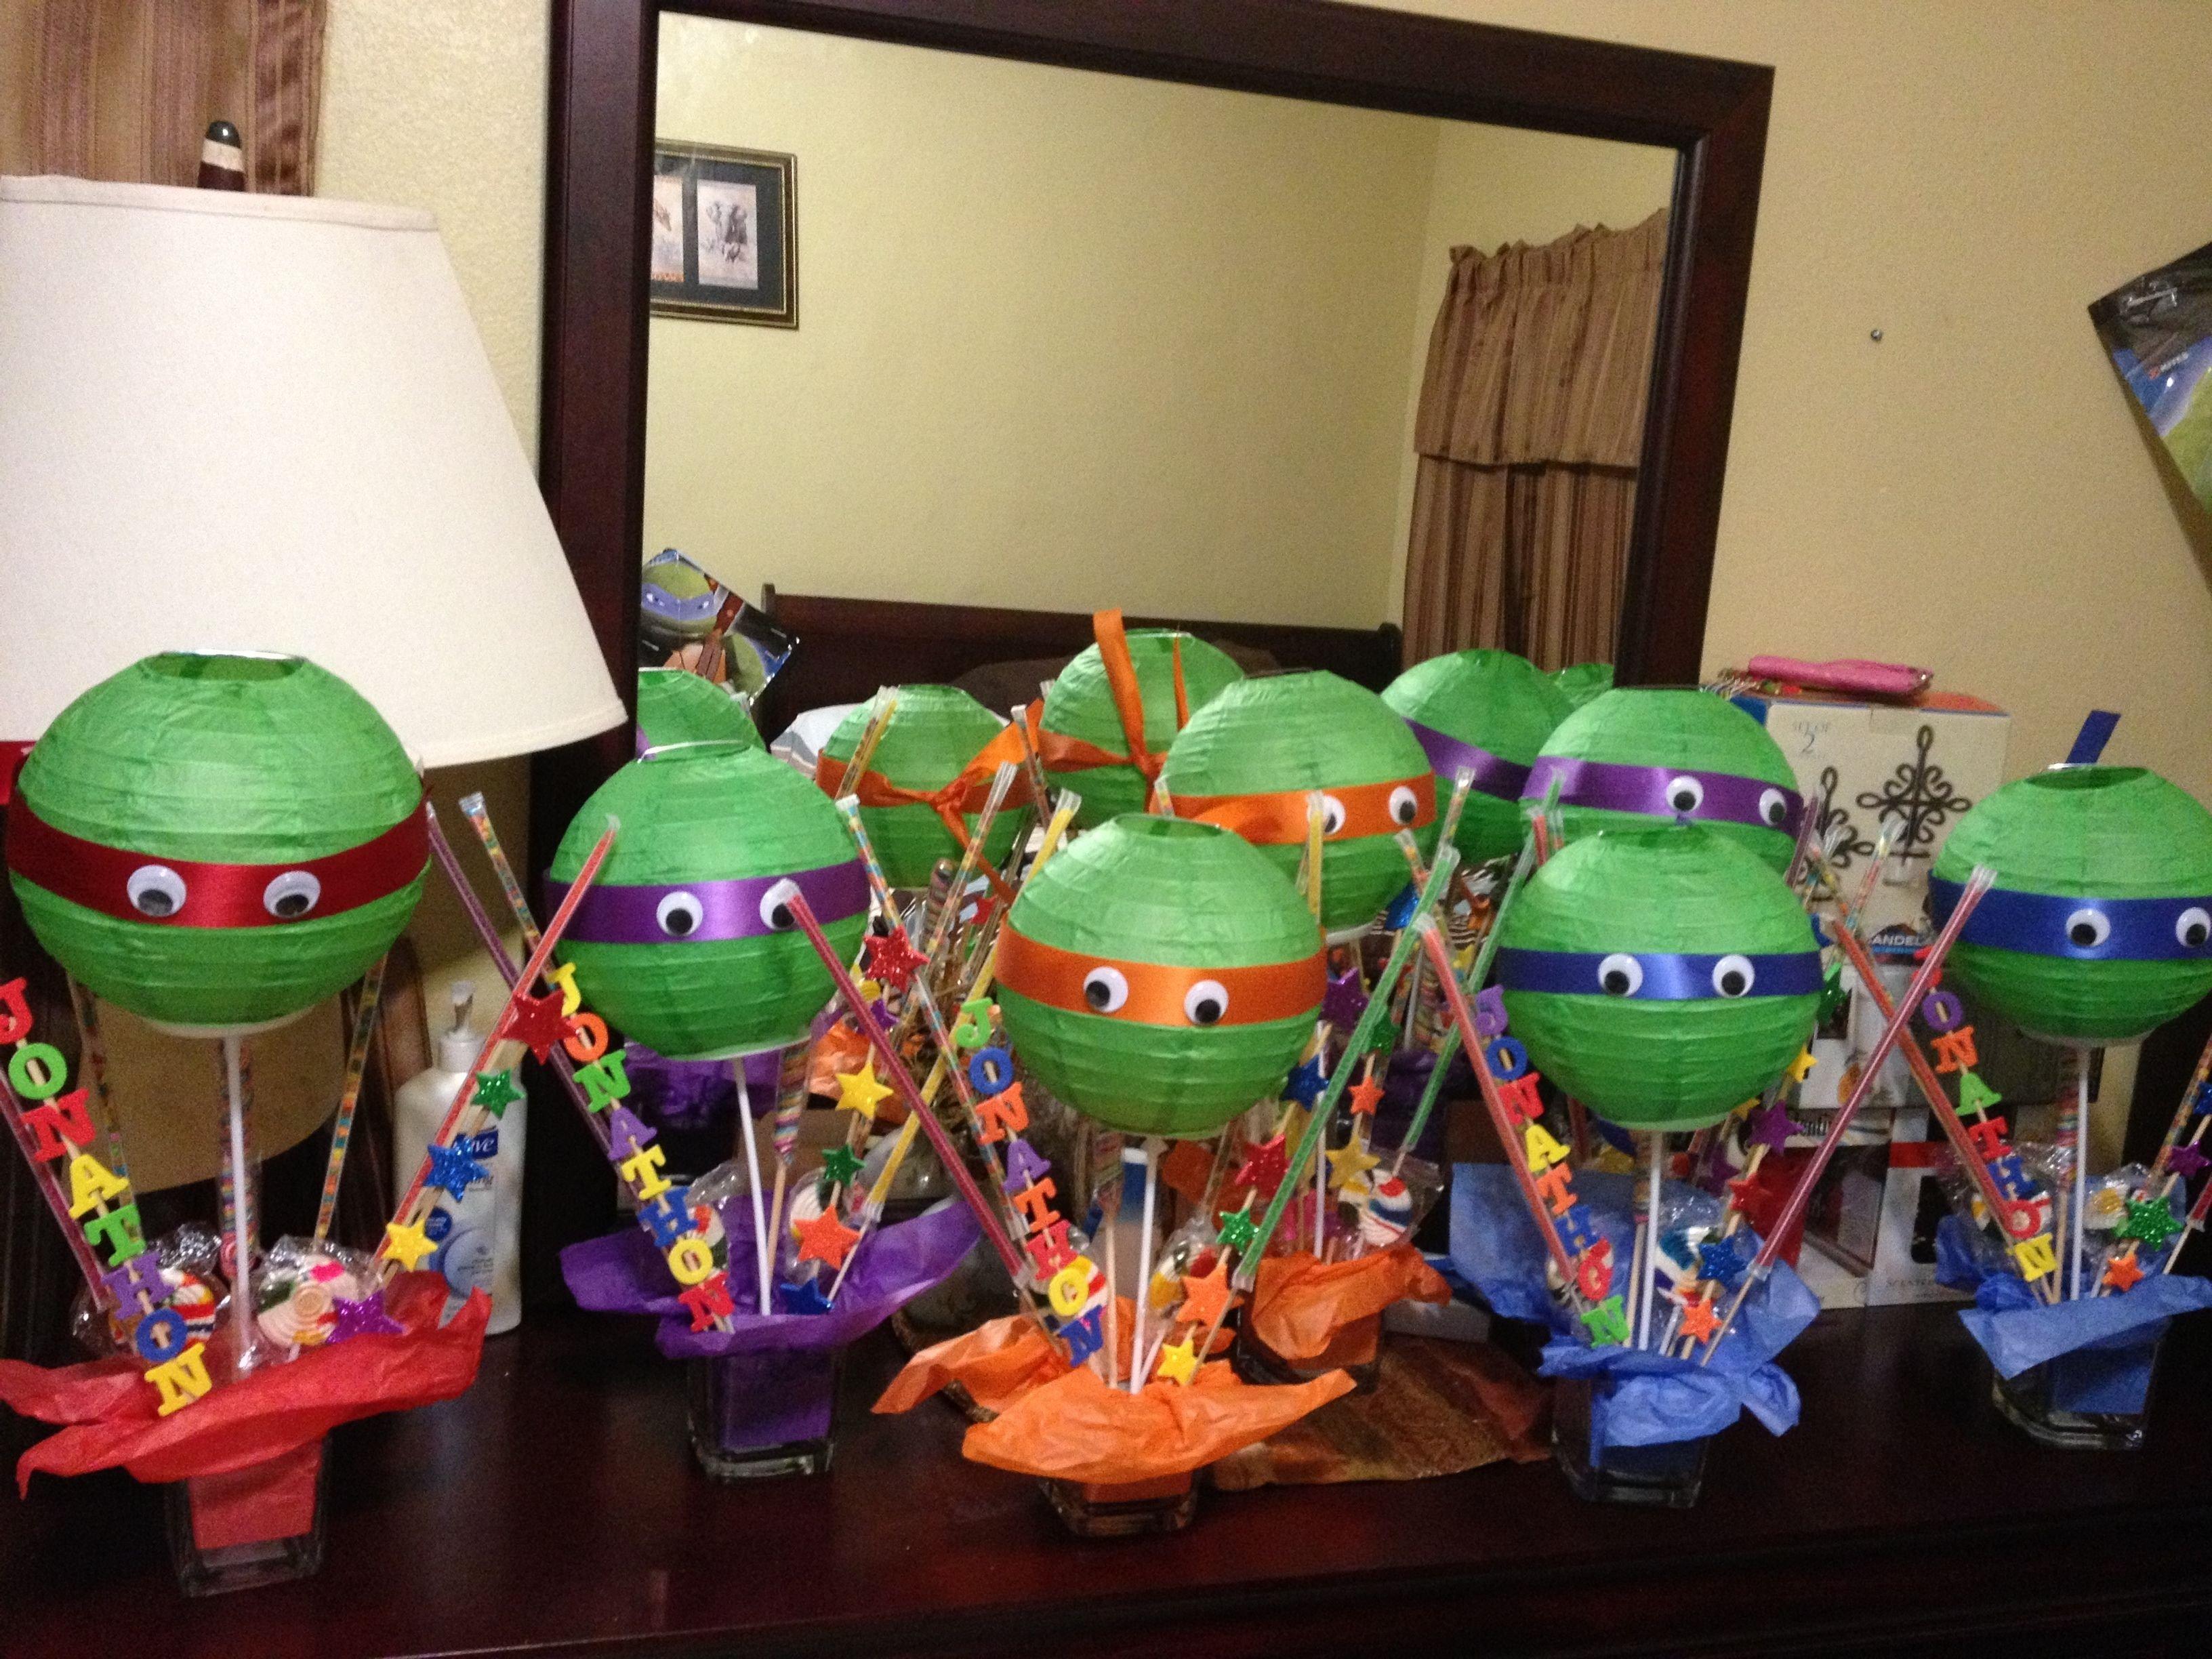 10 Pretty Ninja Turtles Theme Party Ideas diy centerpieces for ninja turtle party birthday parties 3 2020